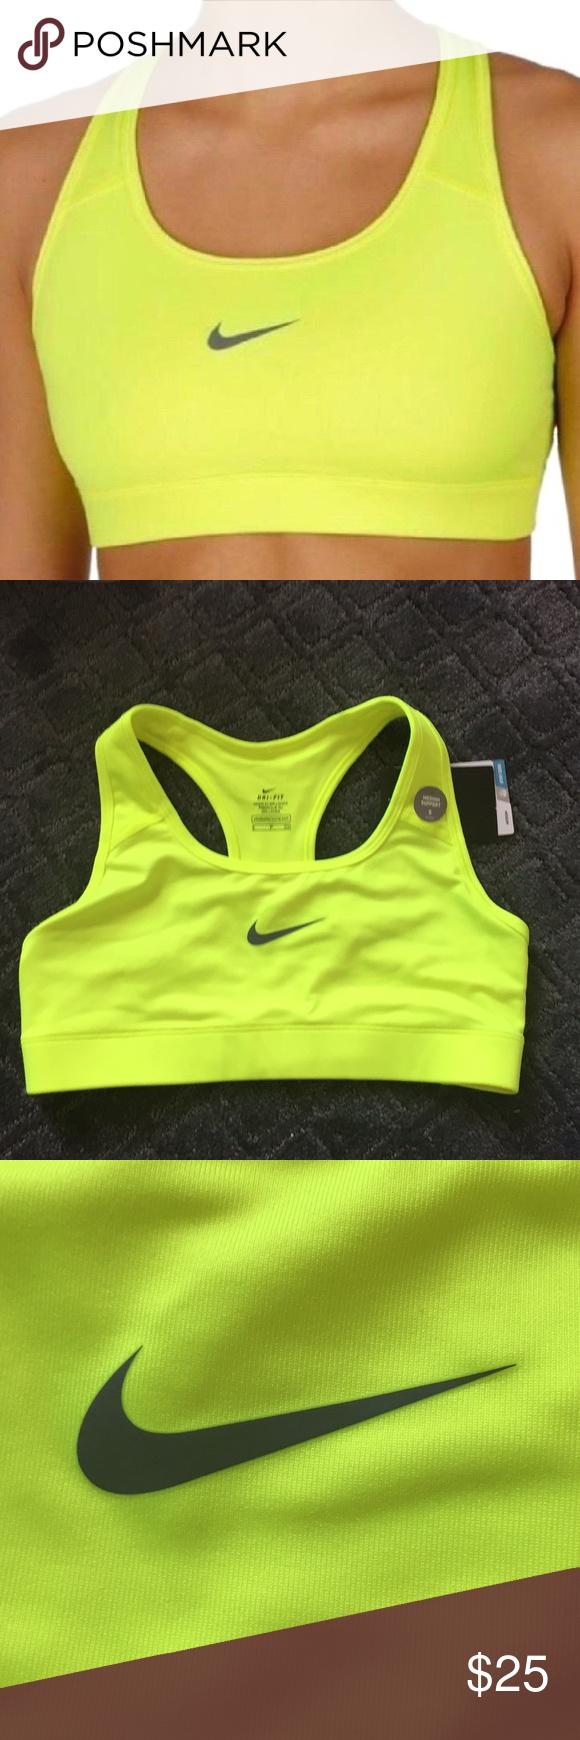 9b461d95c453c Nike Women s Medium Support Neon Yellow Sports Bra NWT Nike Intimates    Sleepwear Bras